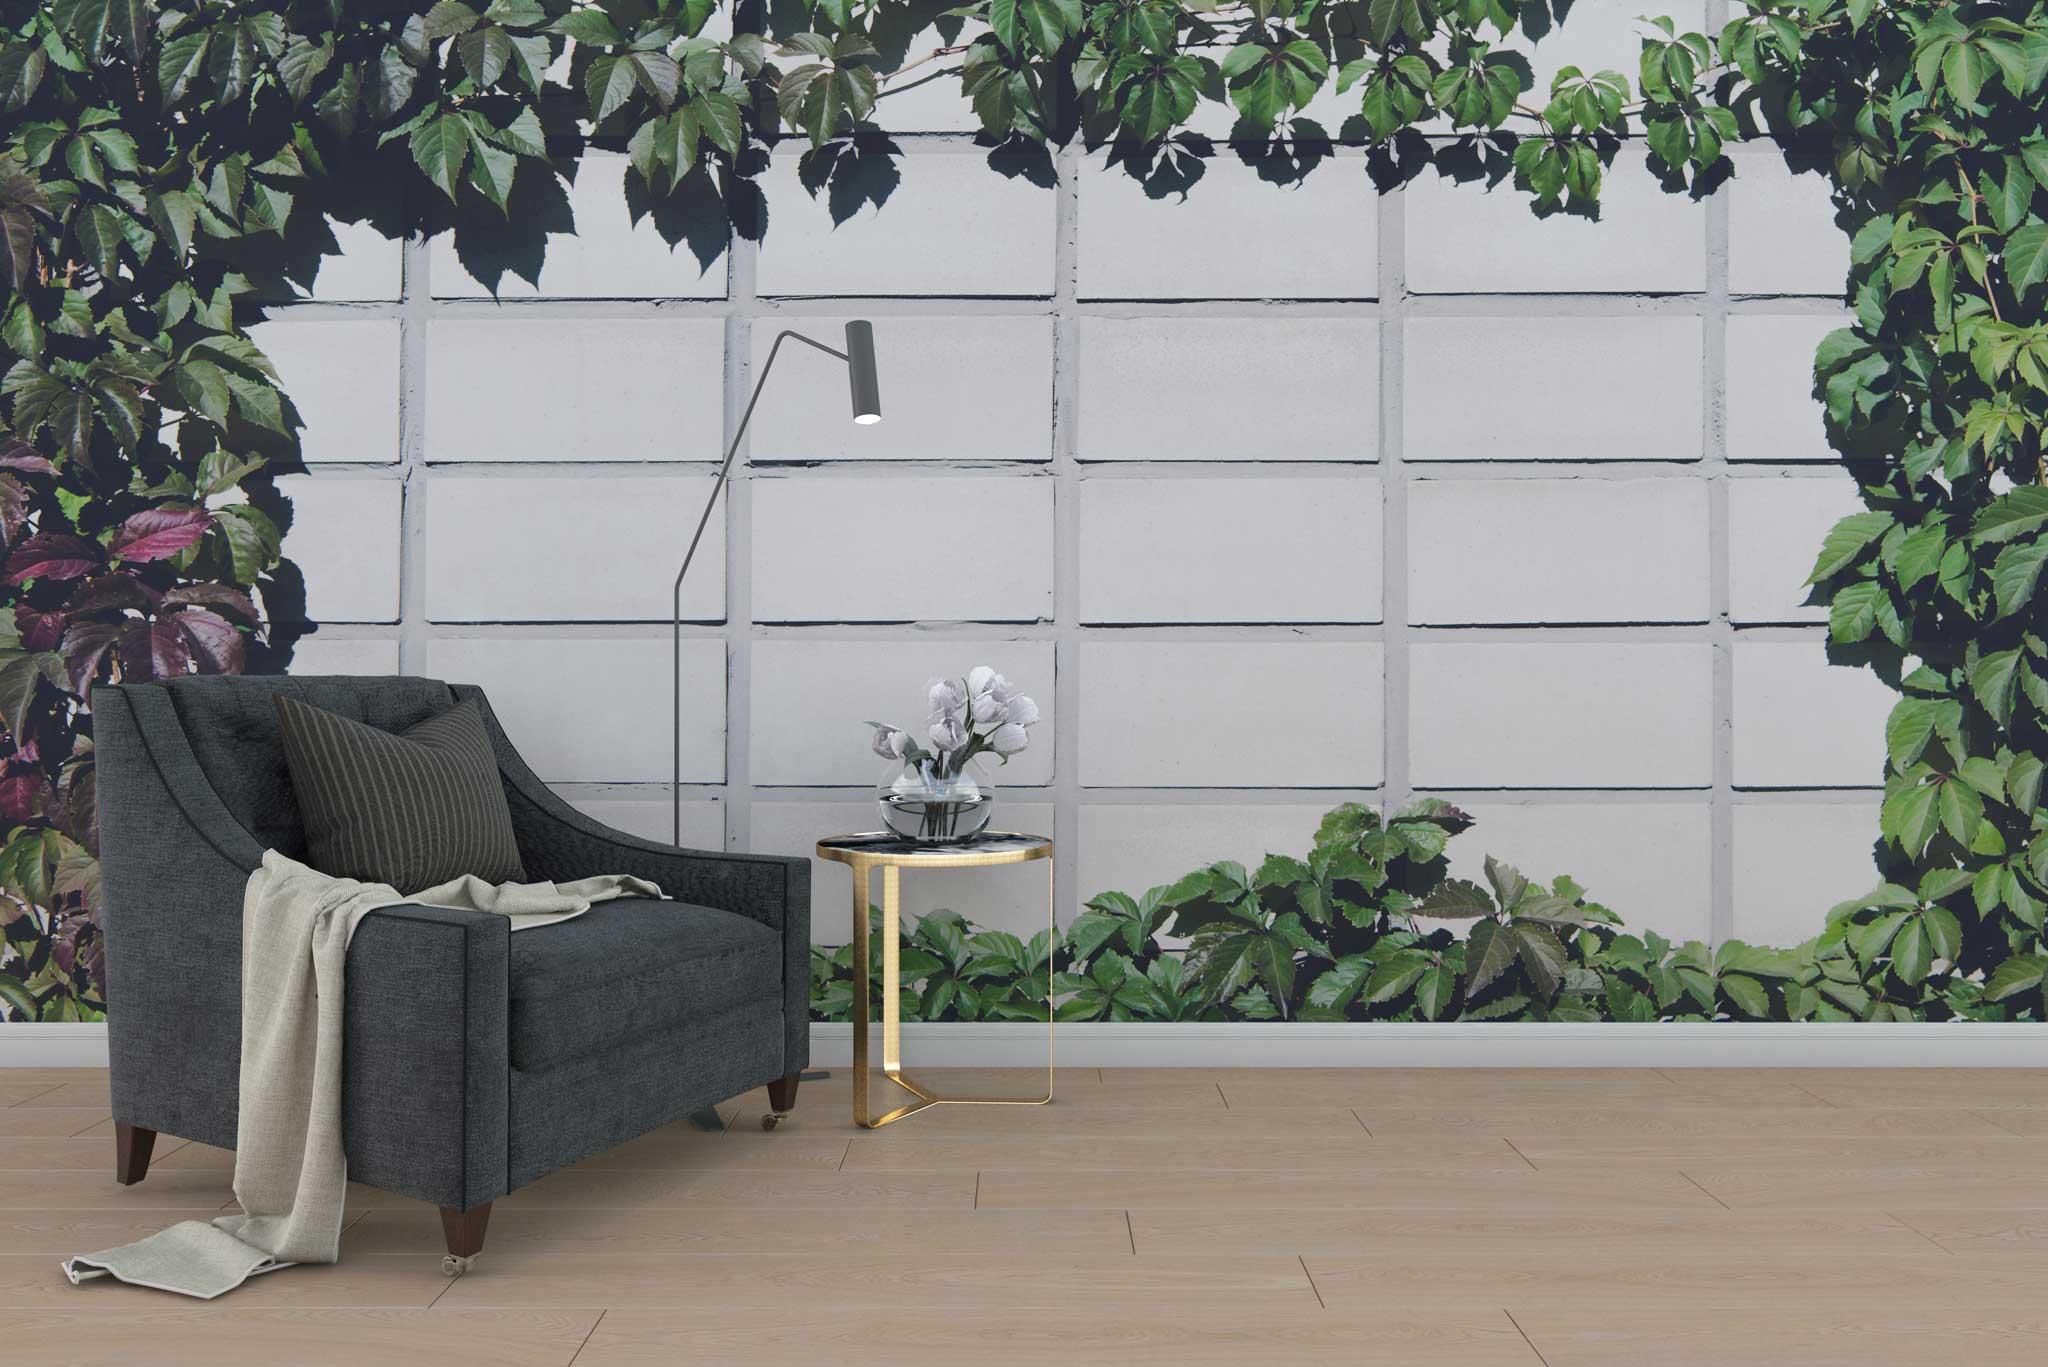 tapet-fototapet-special-personalizat-customizabil-comanda-bucuresti-daring-prints-model-motiv-vegetal-frunze-iedera-perete-beton-verde